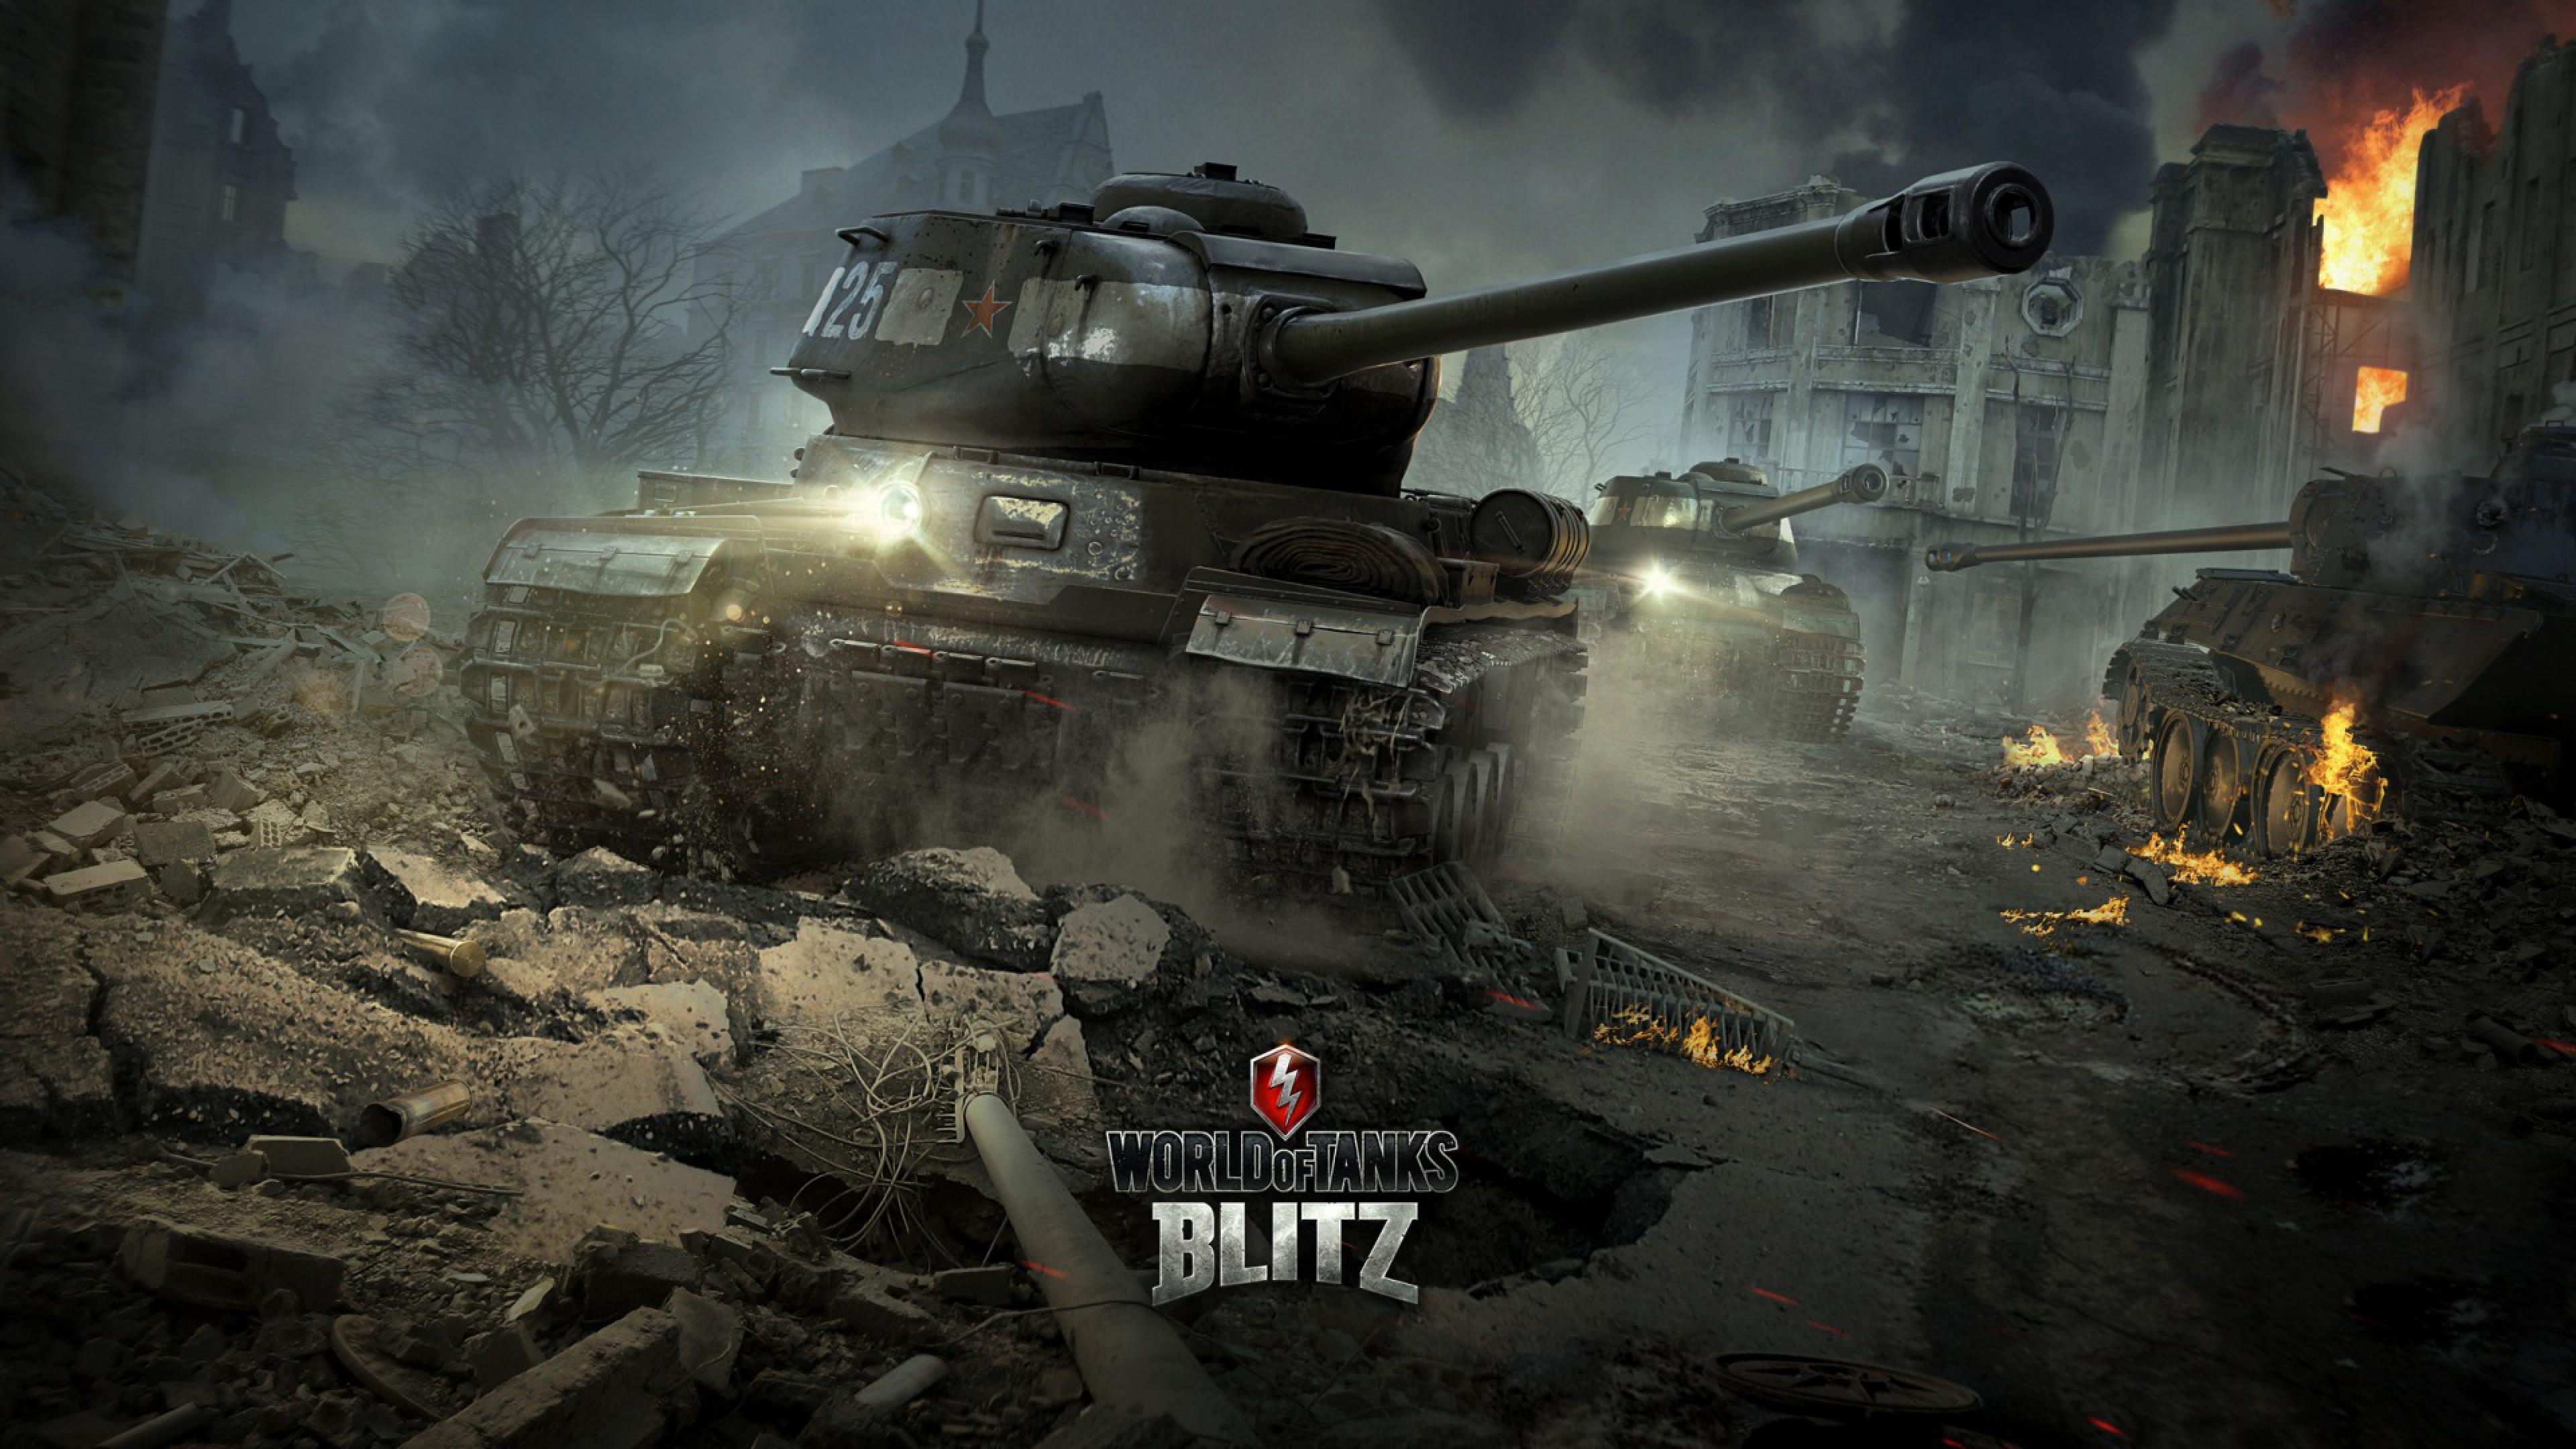 2016 world of tanks 1535966363 - 2016 World Of Tanks - xbox games wallpapers, world of tanks wallpapers, games wallpapers